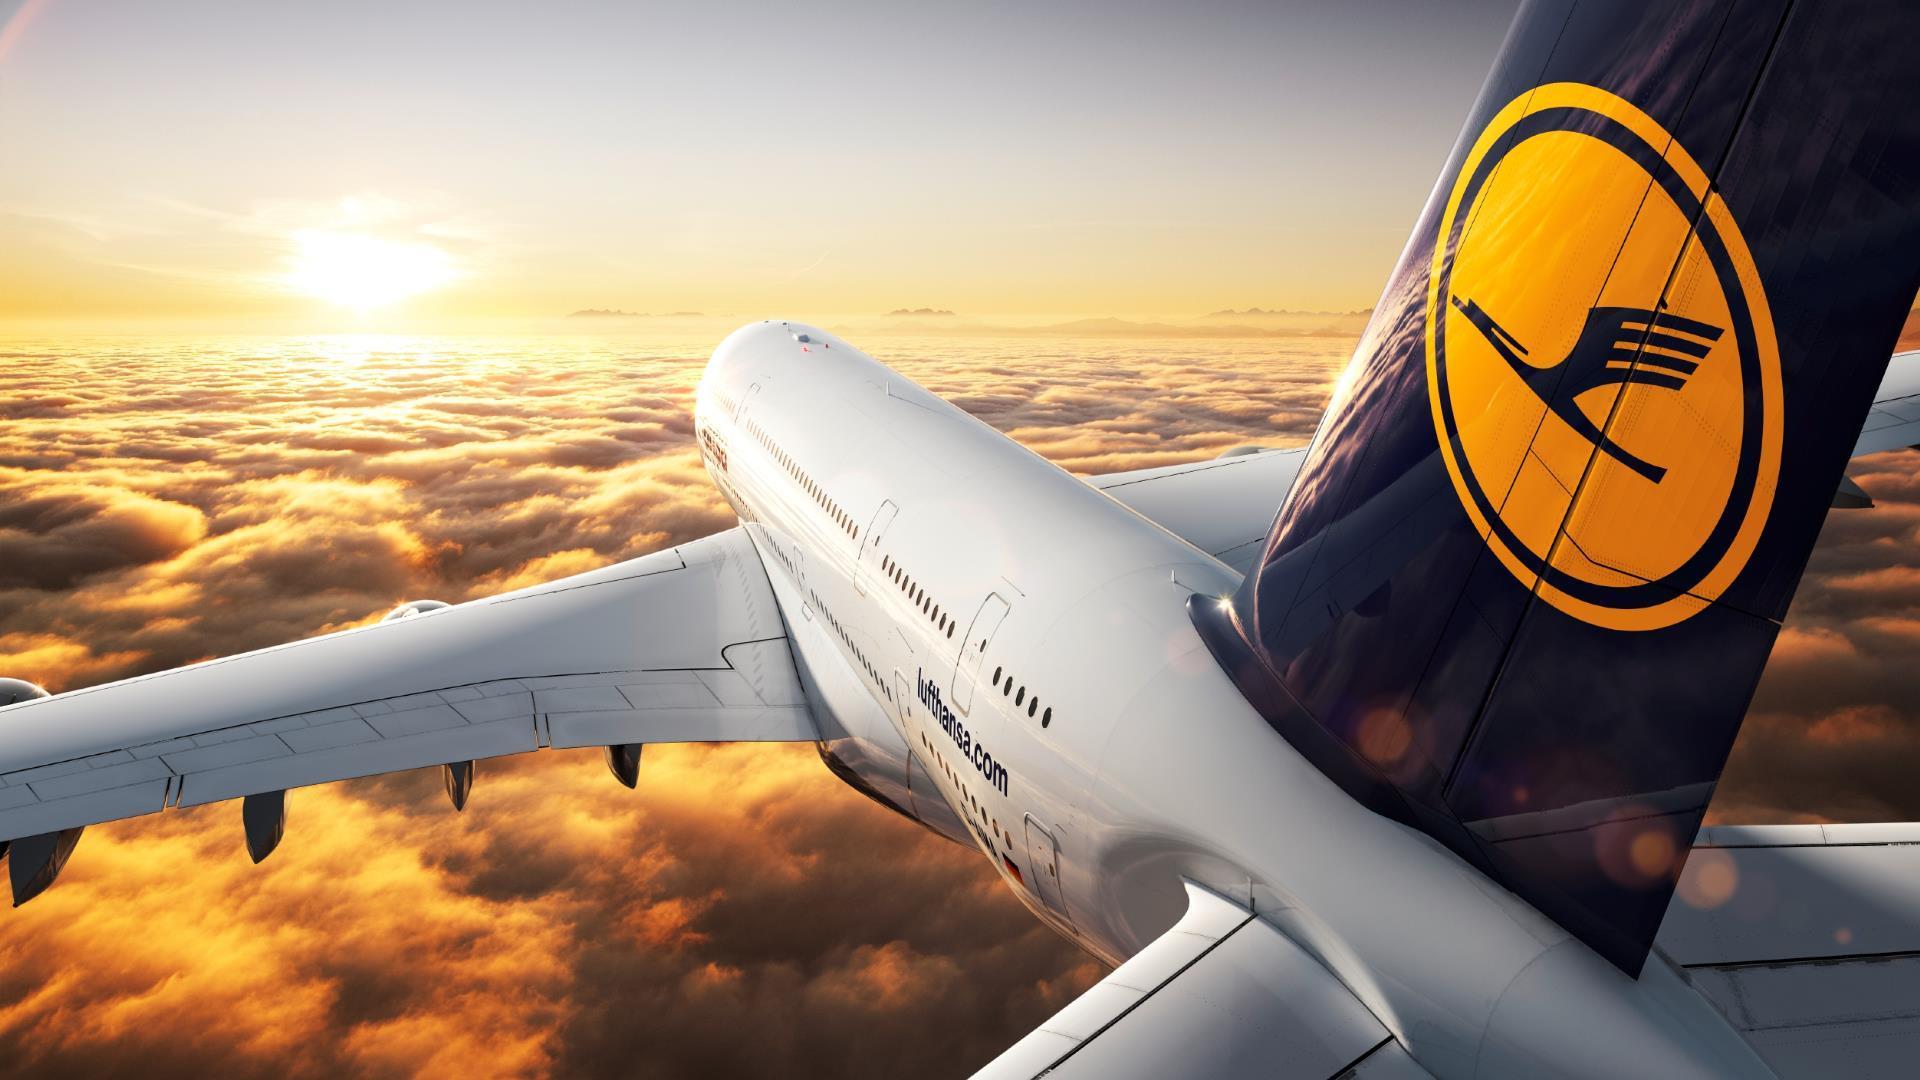 Lufthansa agrega una tarifa más barata para pasajes: Economy Light